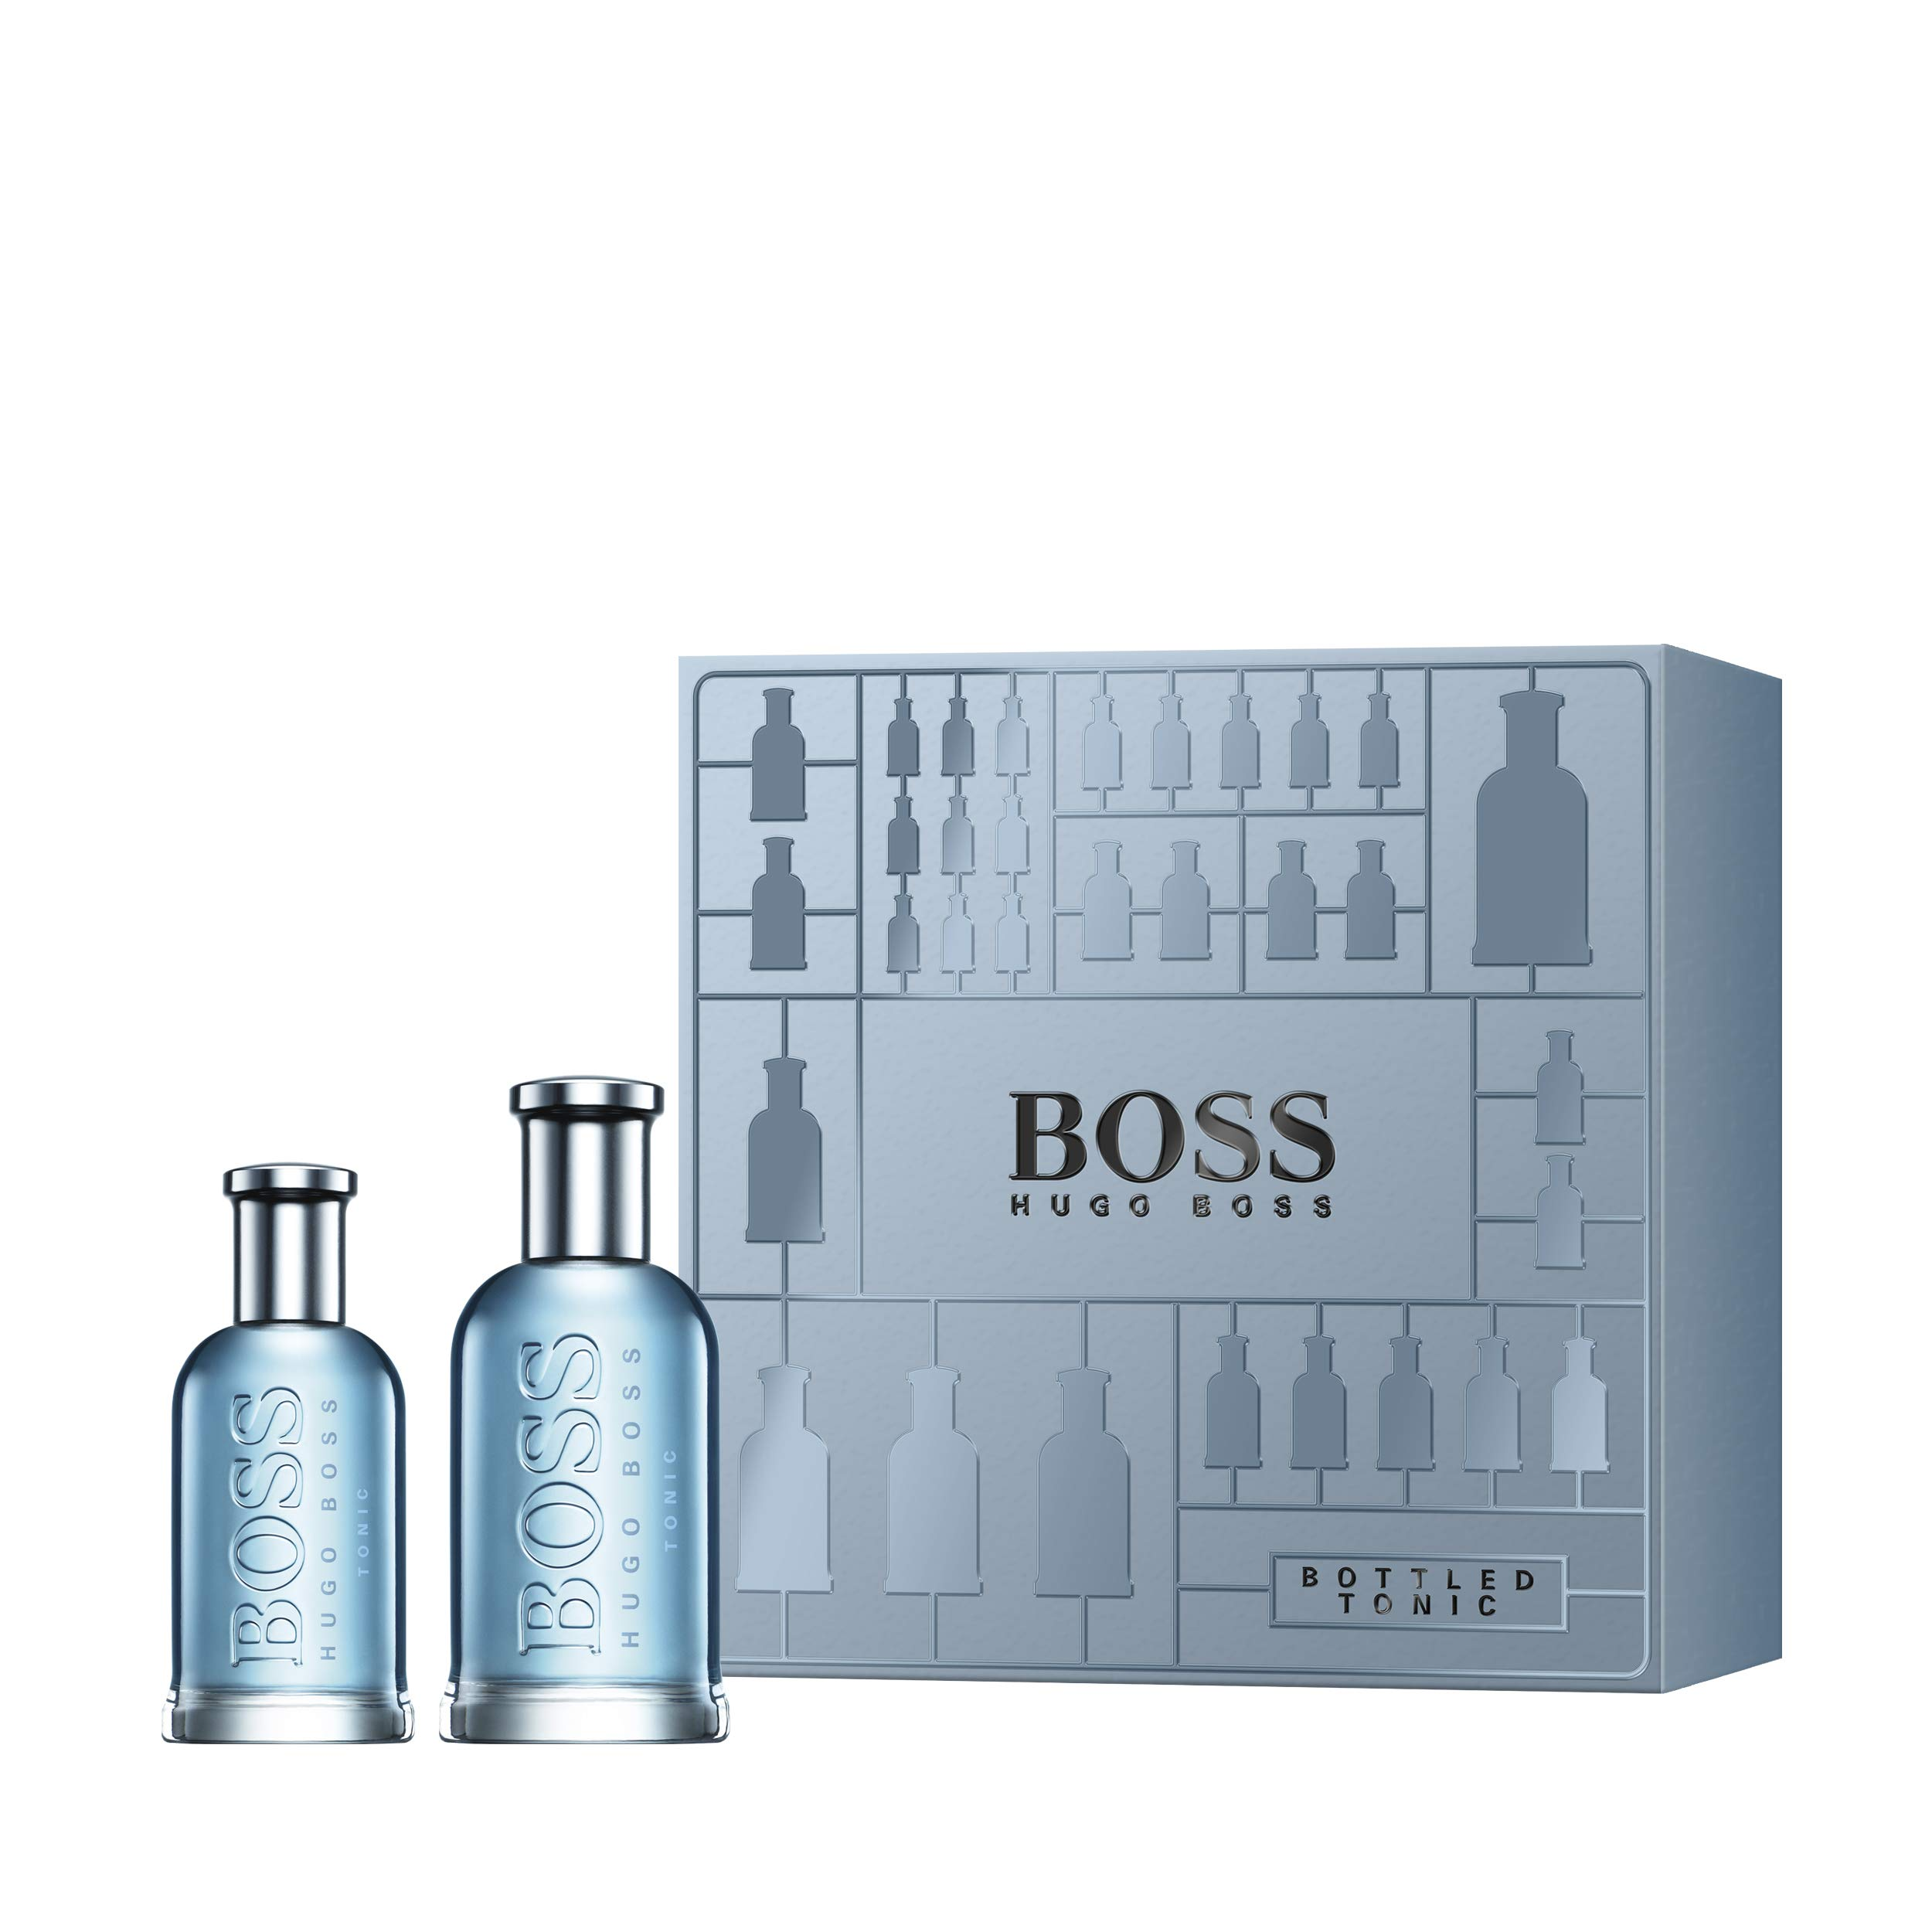 Hugo Boss BOSS Bottled Tonic Eau de Toilette Giftset, 5.1 fl. oz. by Hugo Boss